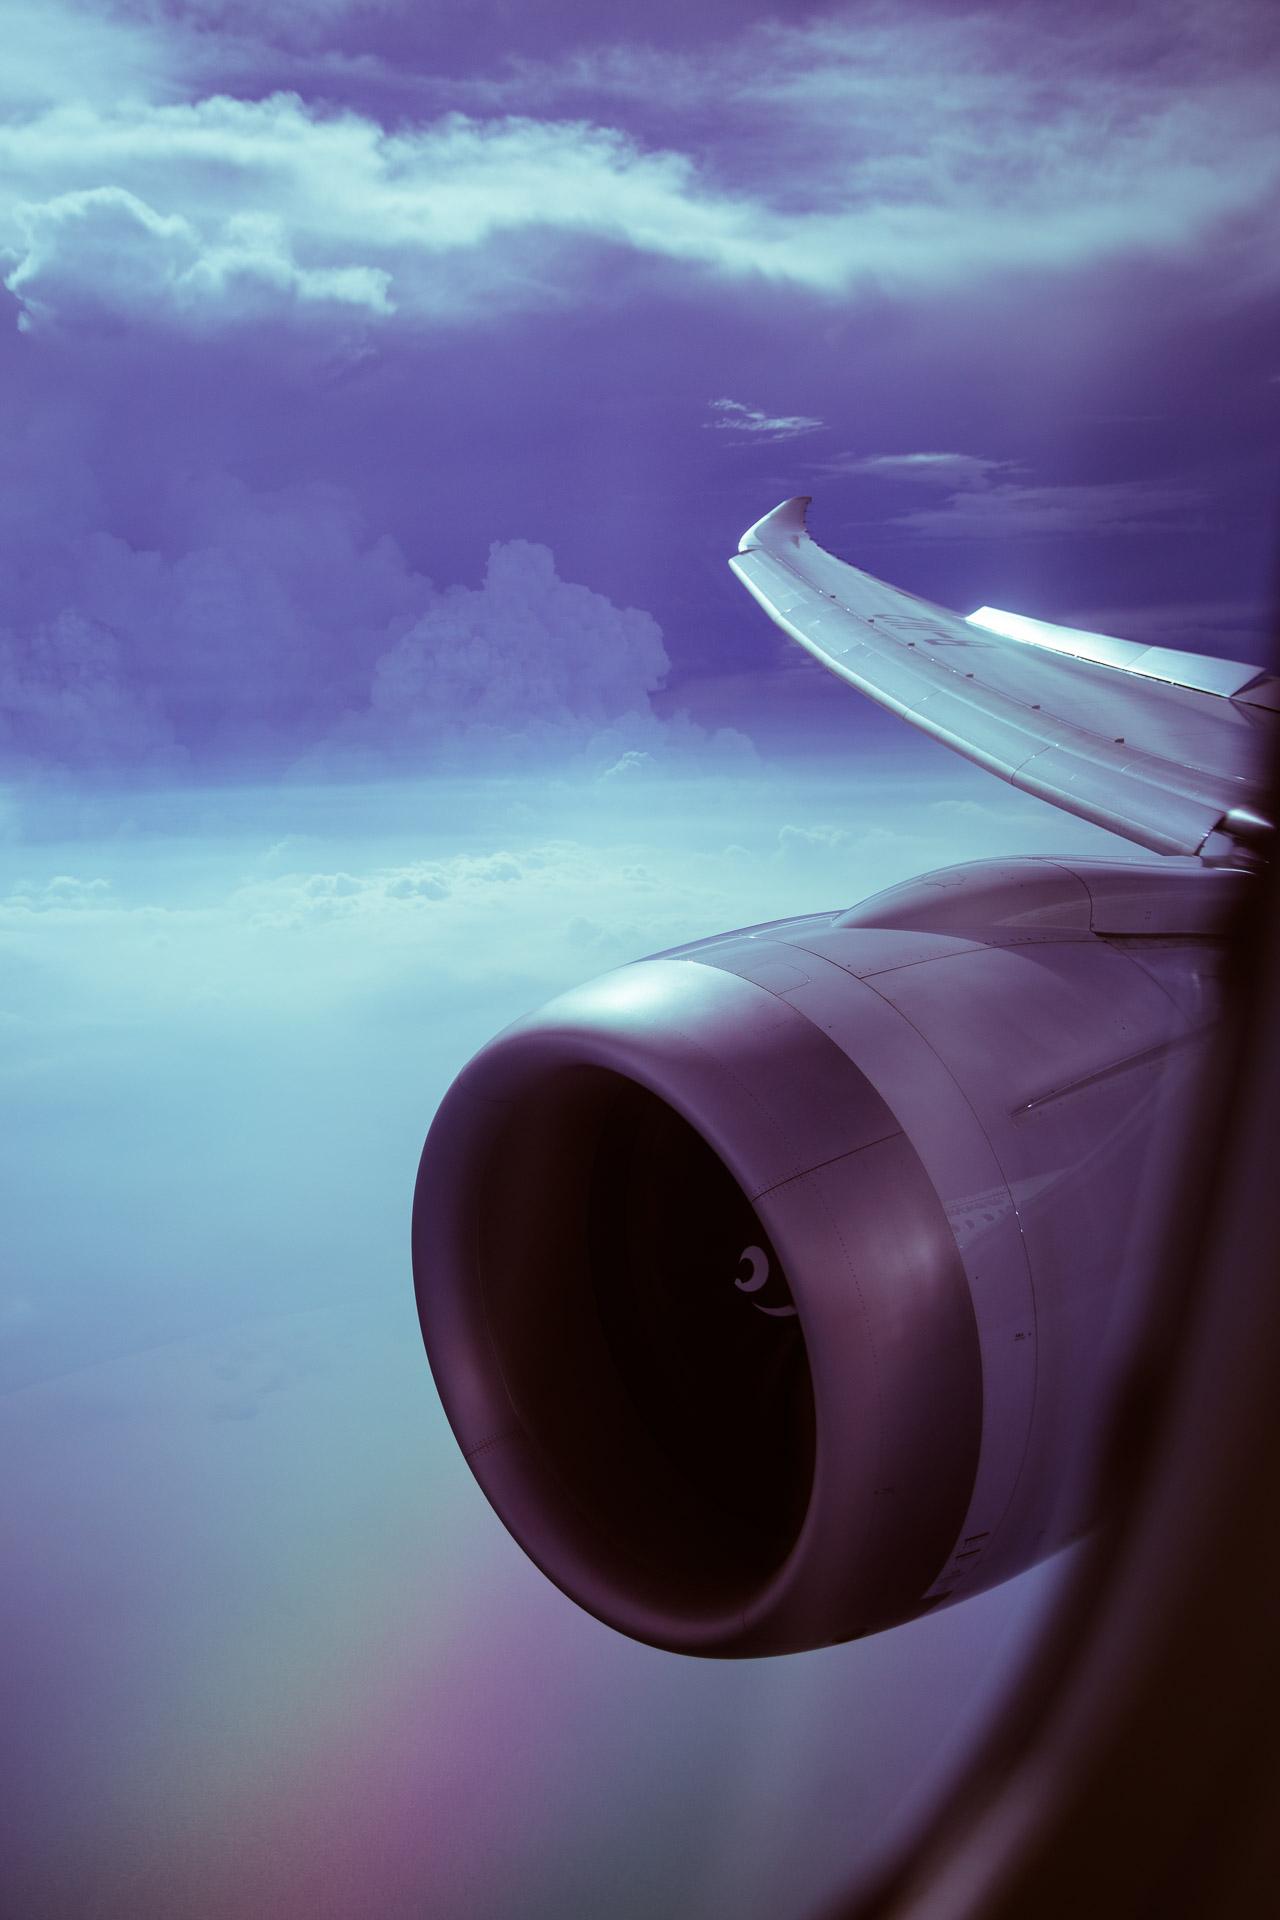 aviation-photographer-lifestyle-china-eastern-singapore-destination-0185.jpg